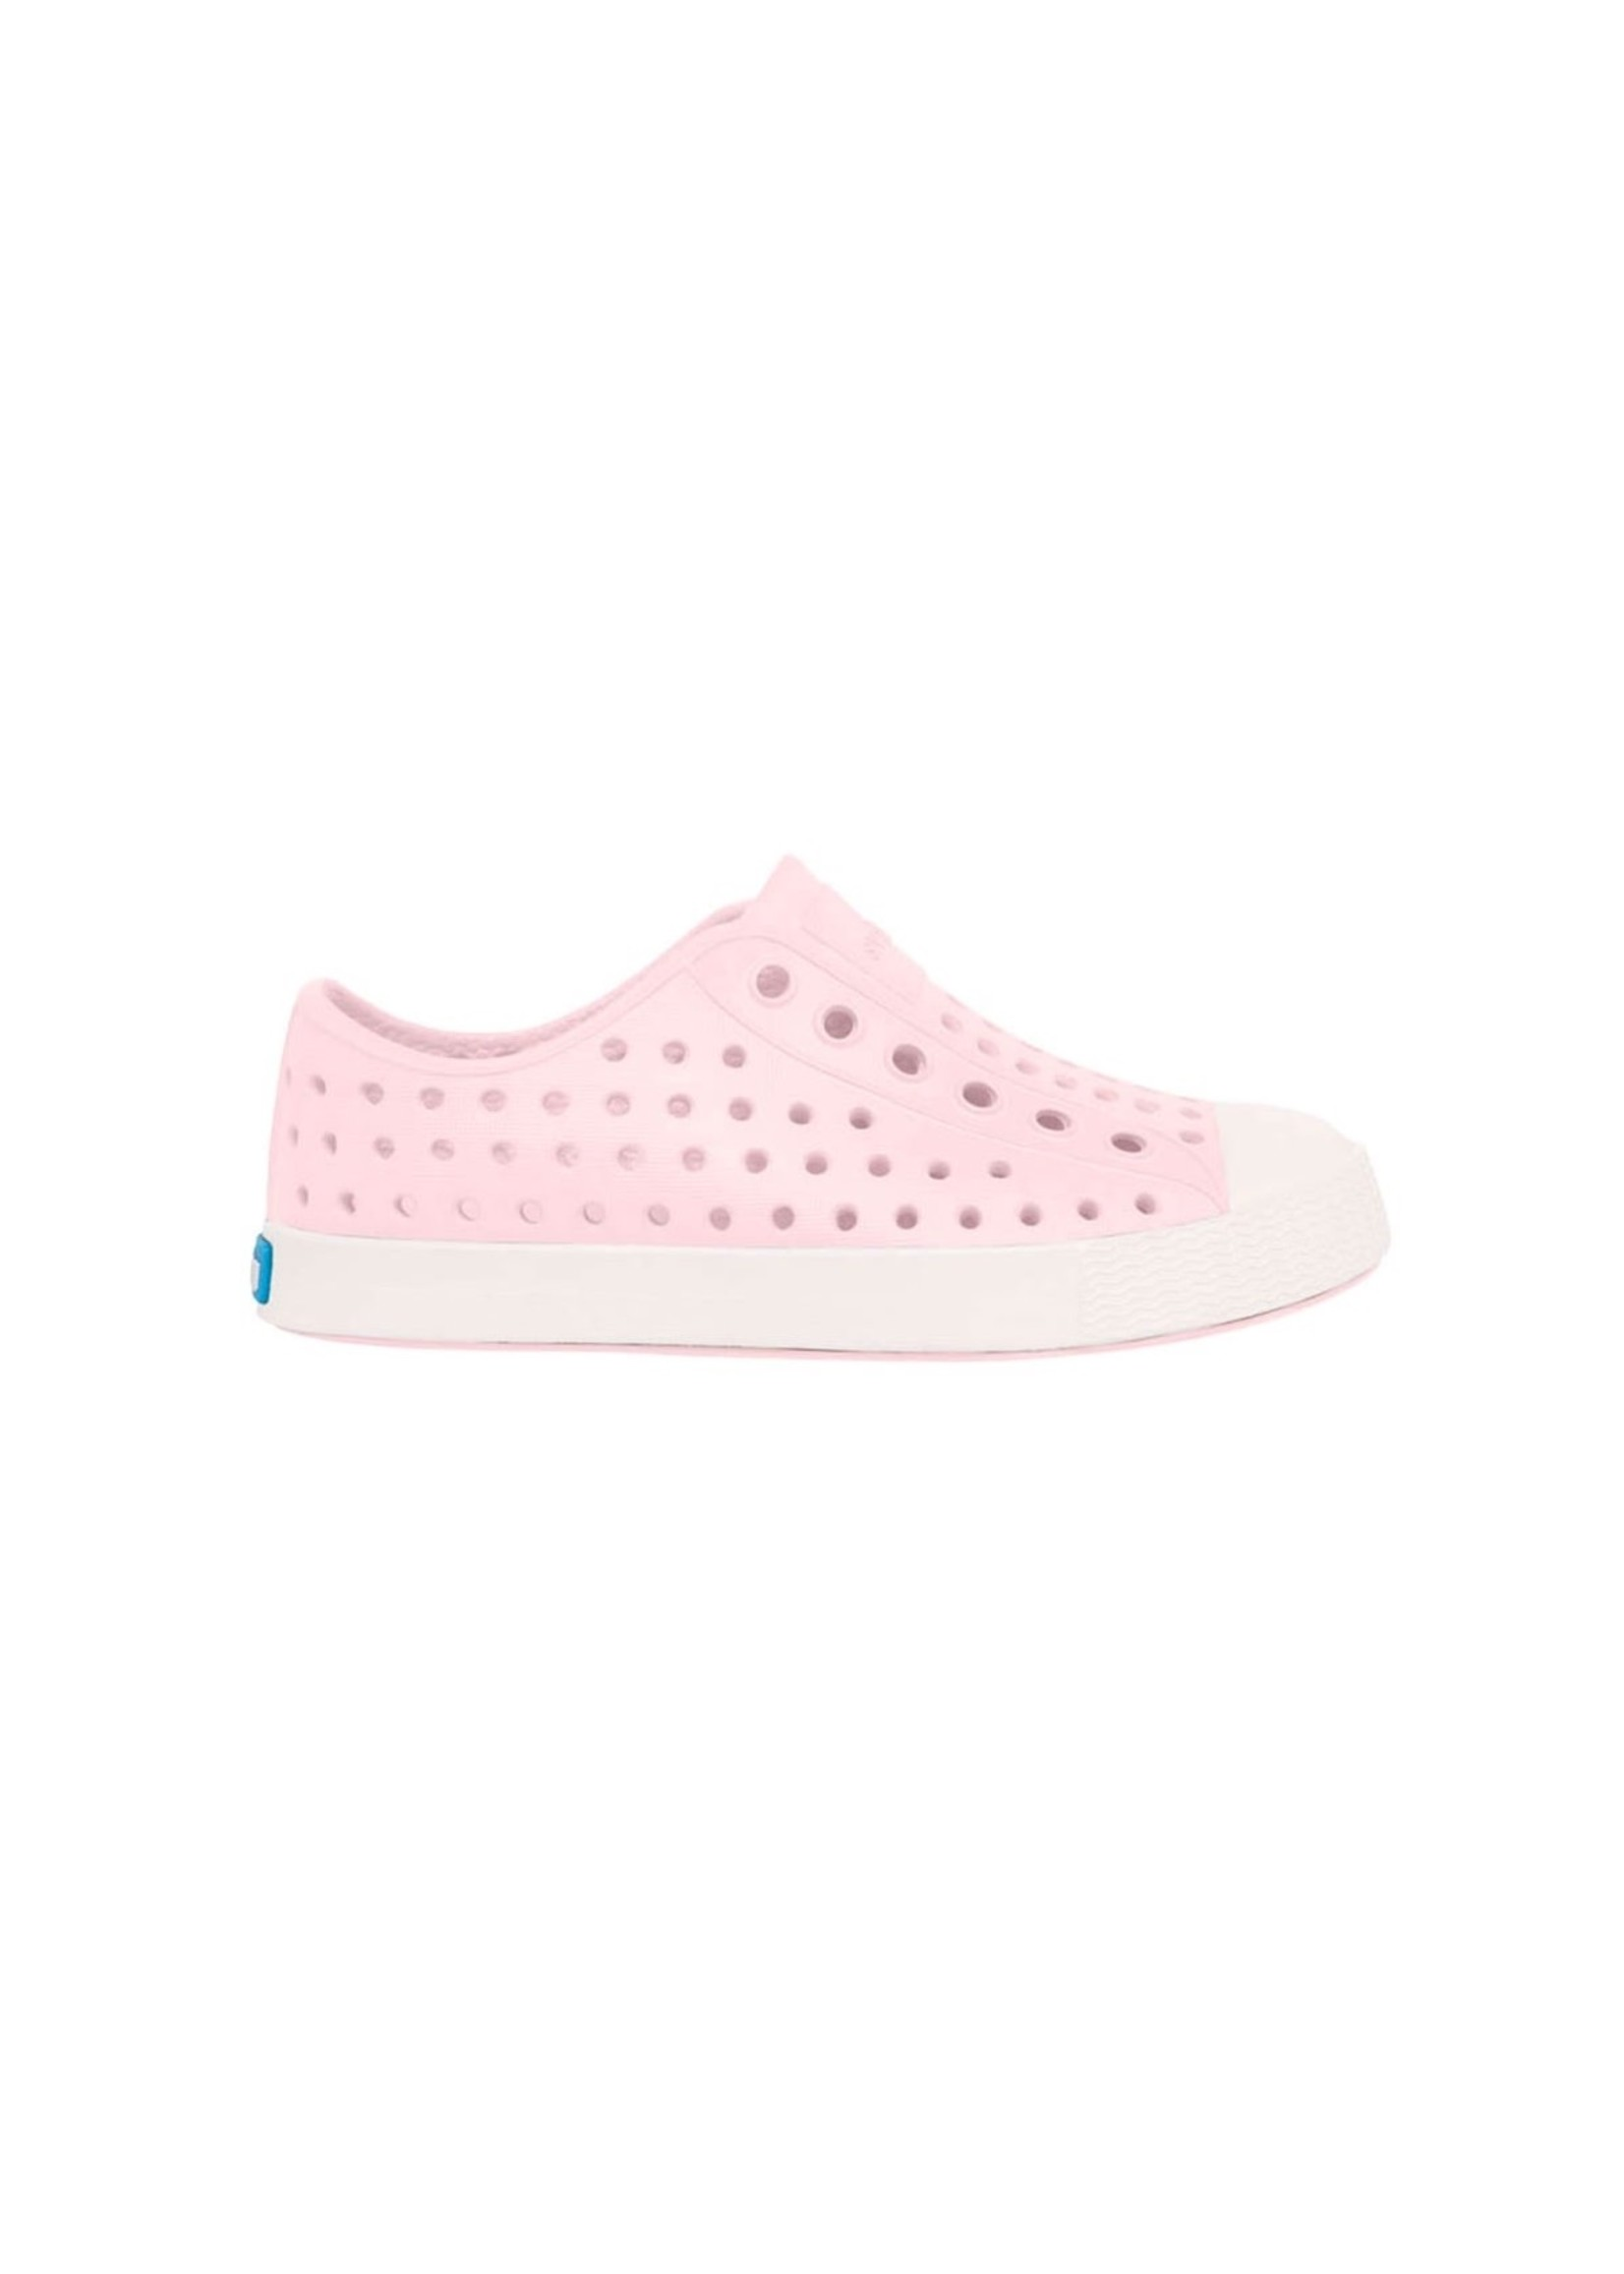 NATIVE shoes JEFFERSON Kids, Milk Pink